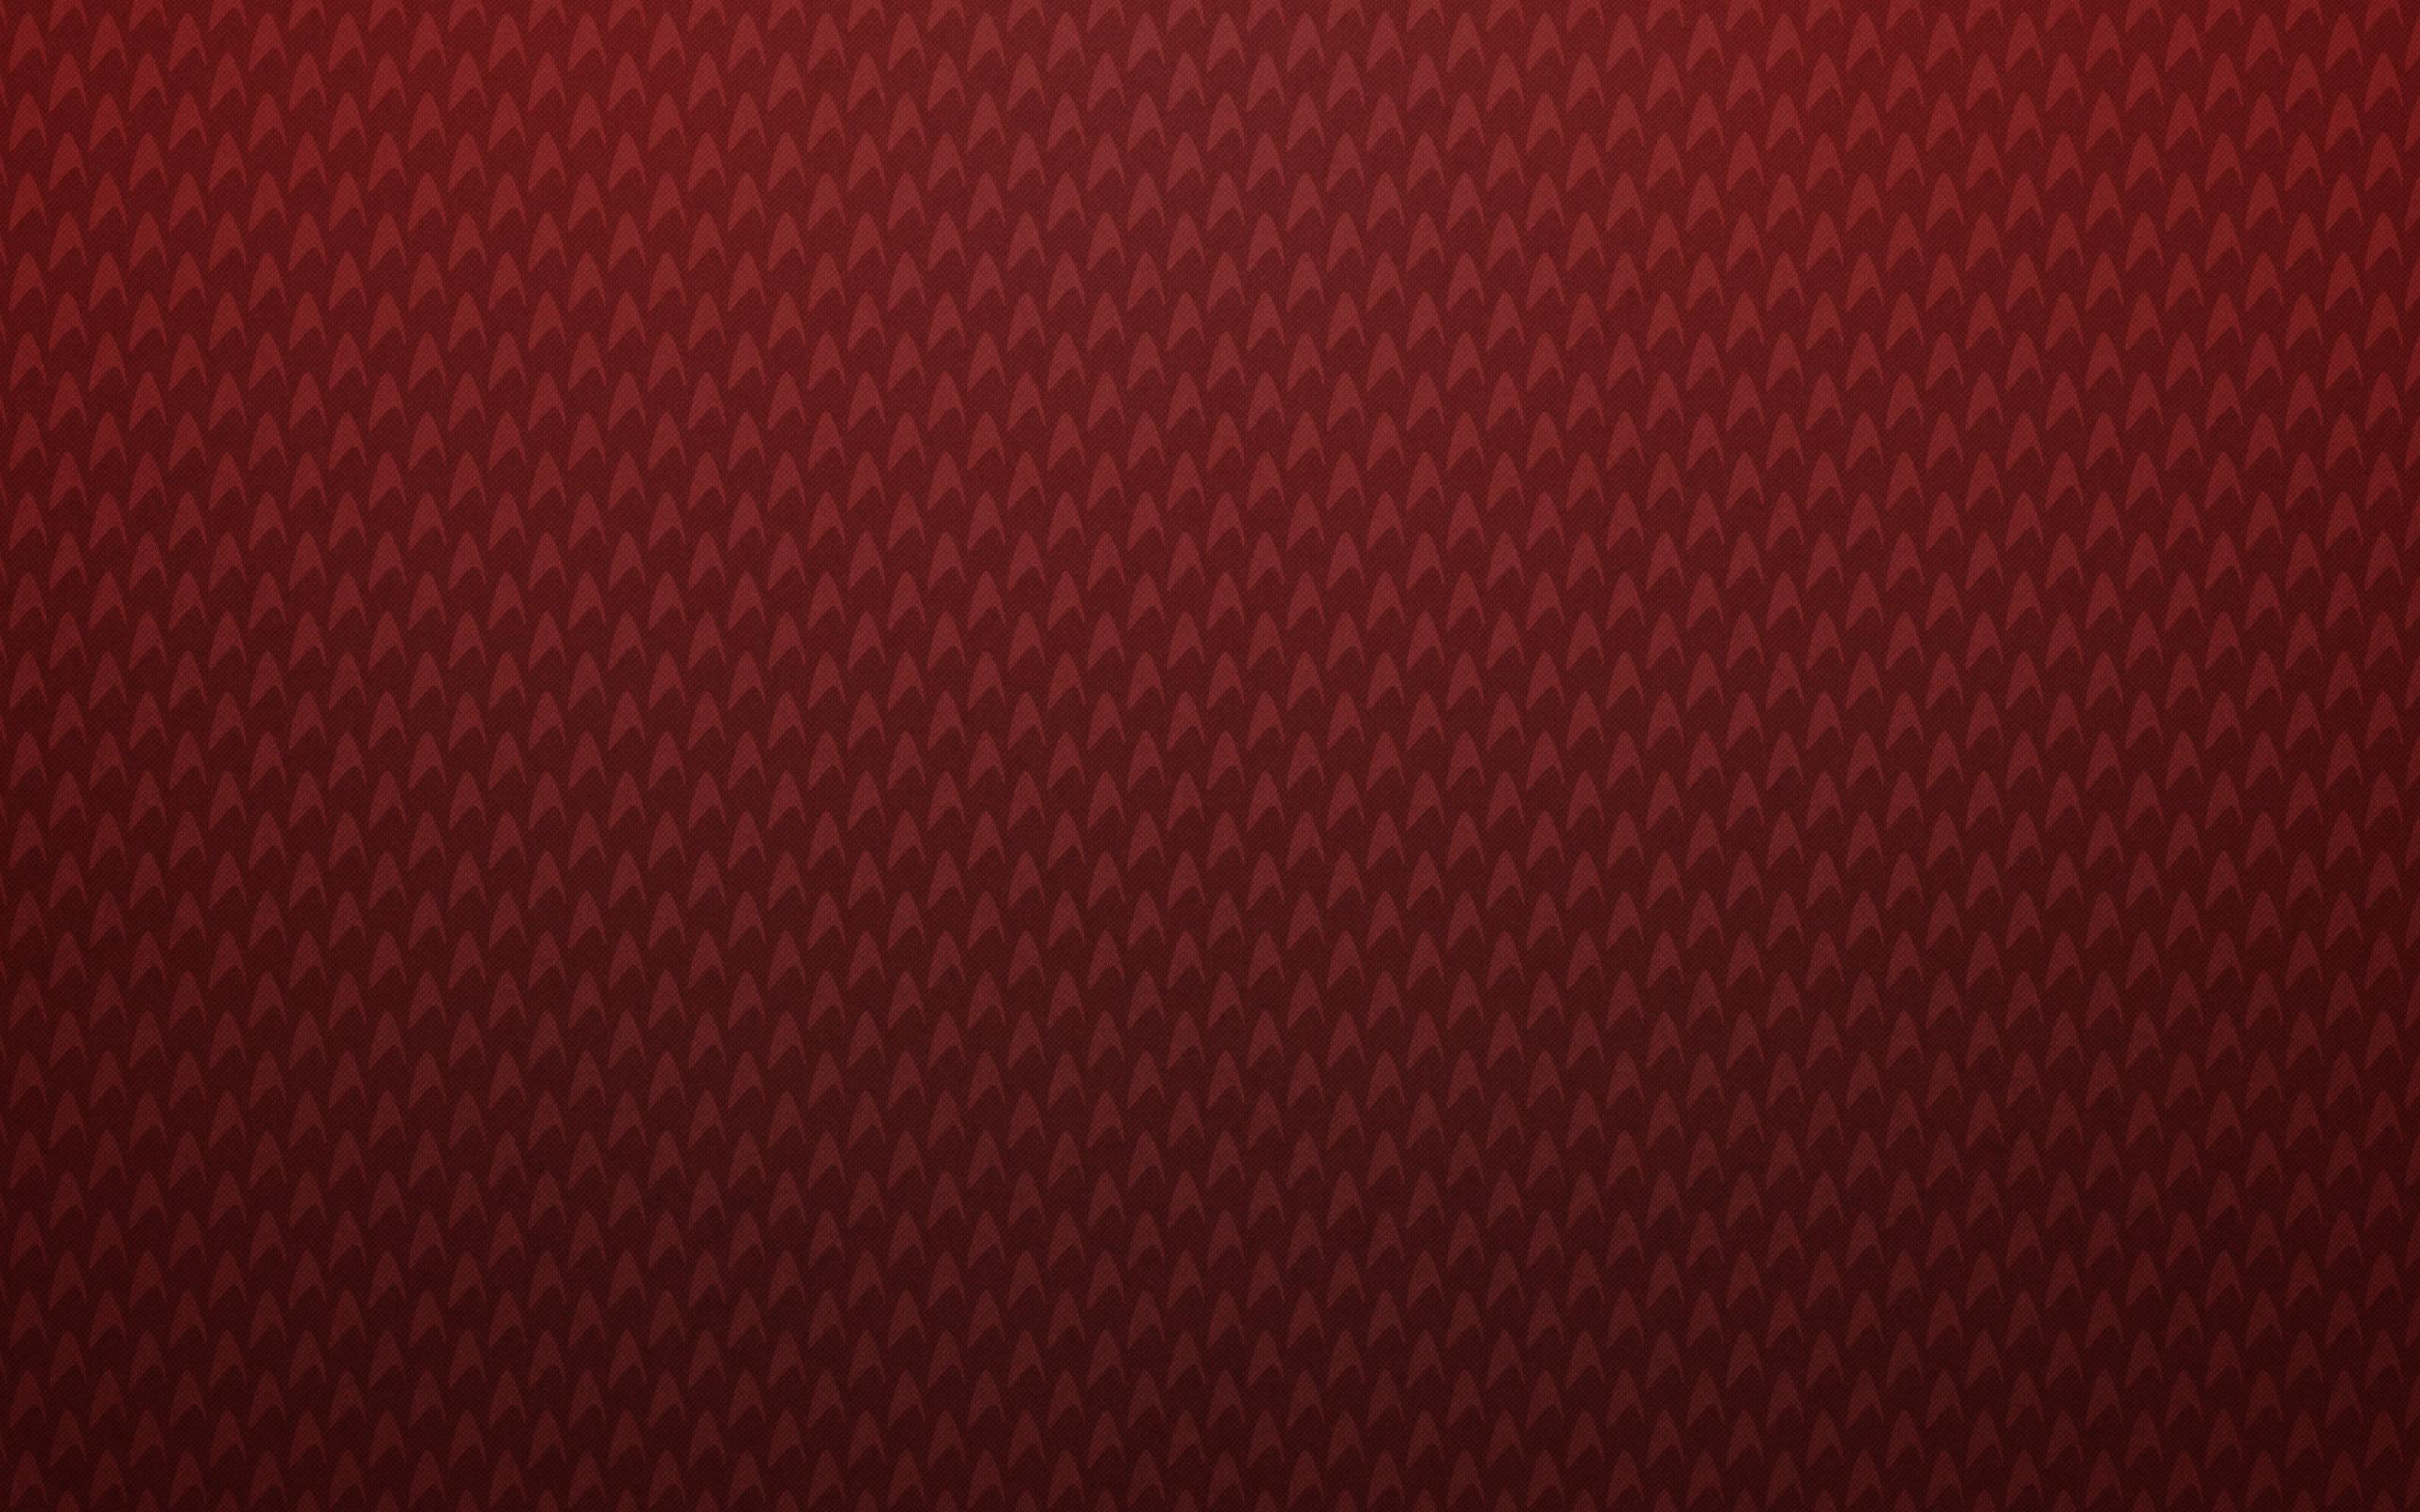 Red patterns textures backgrounds triangle star trek logos wallpaper 2560x1600